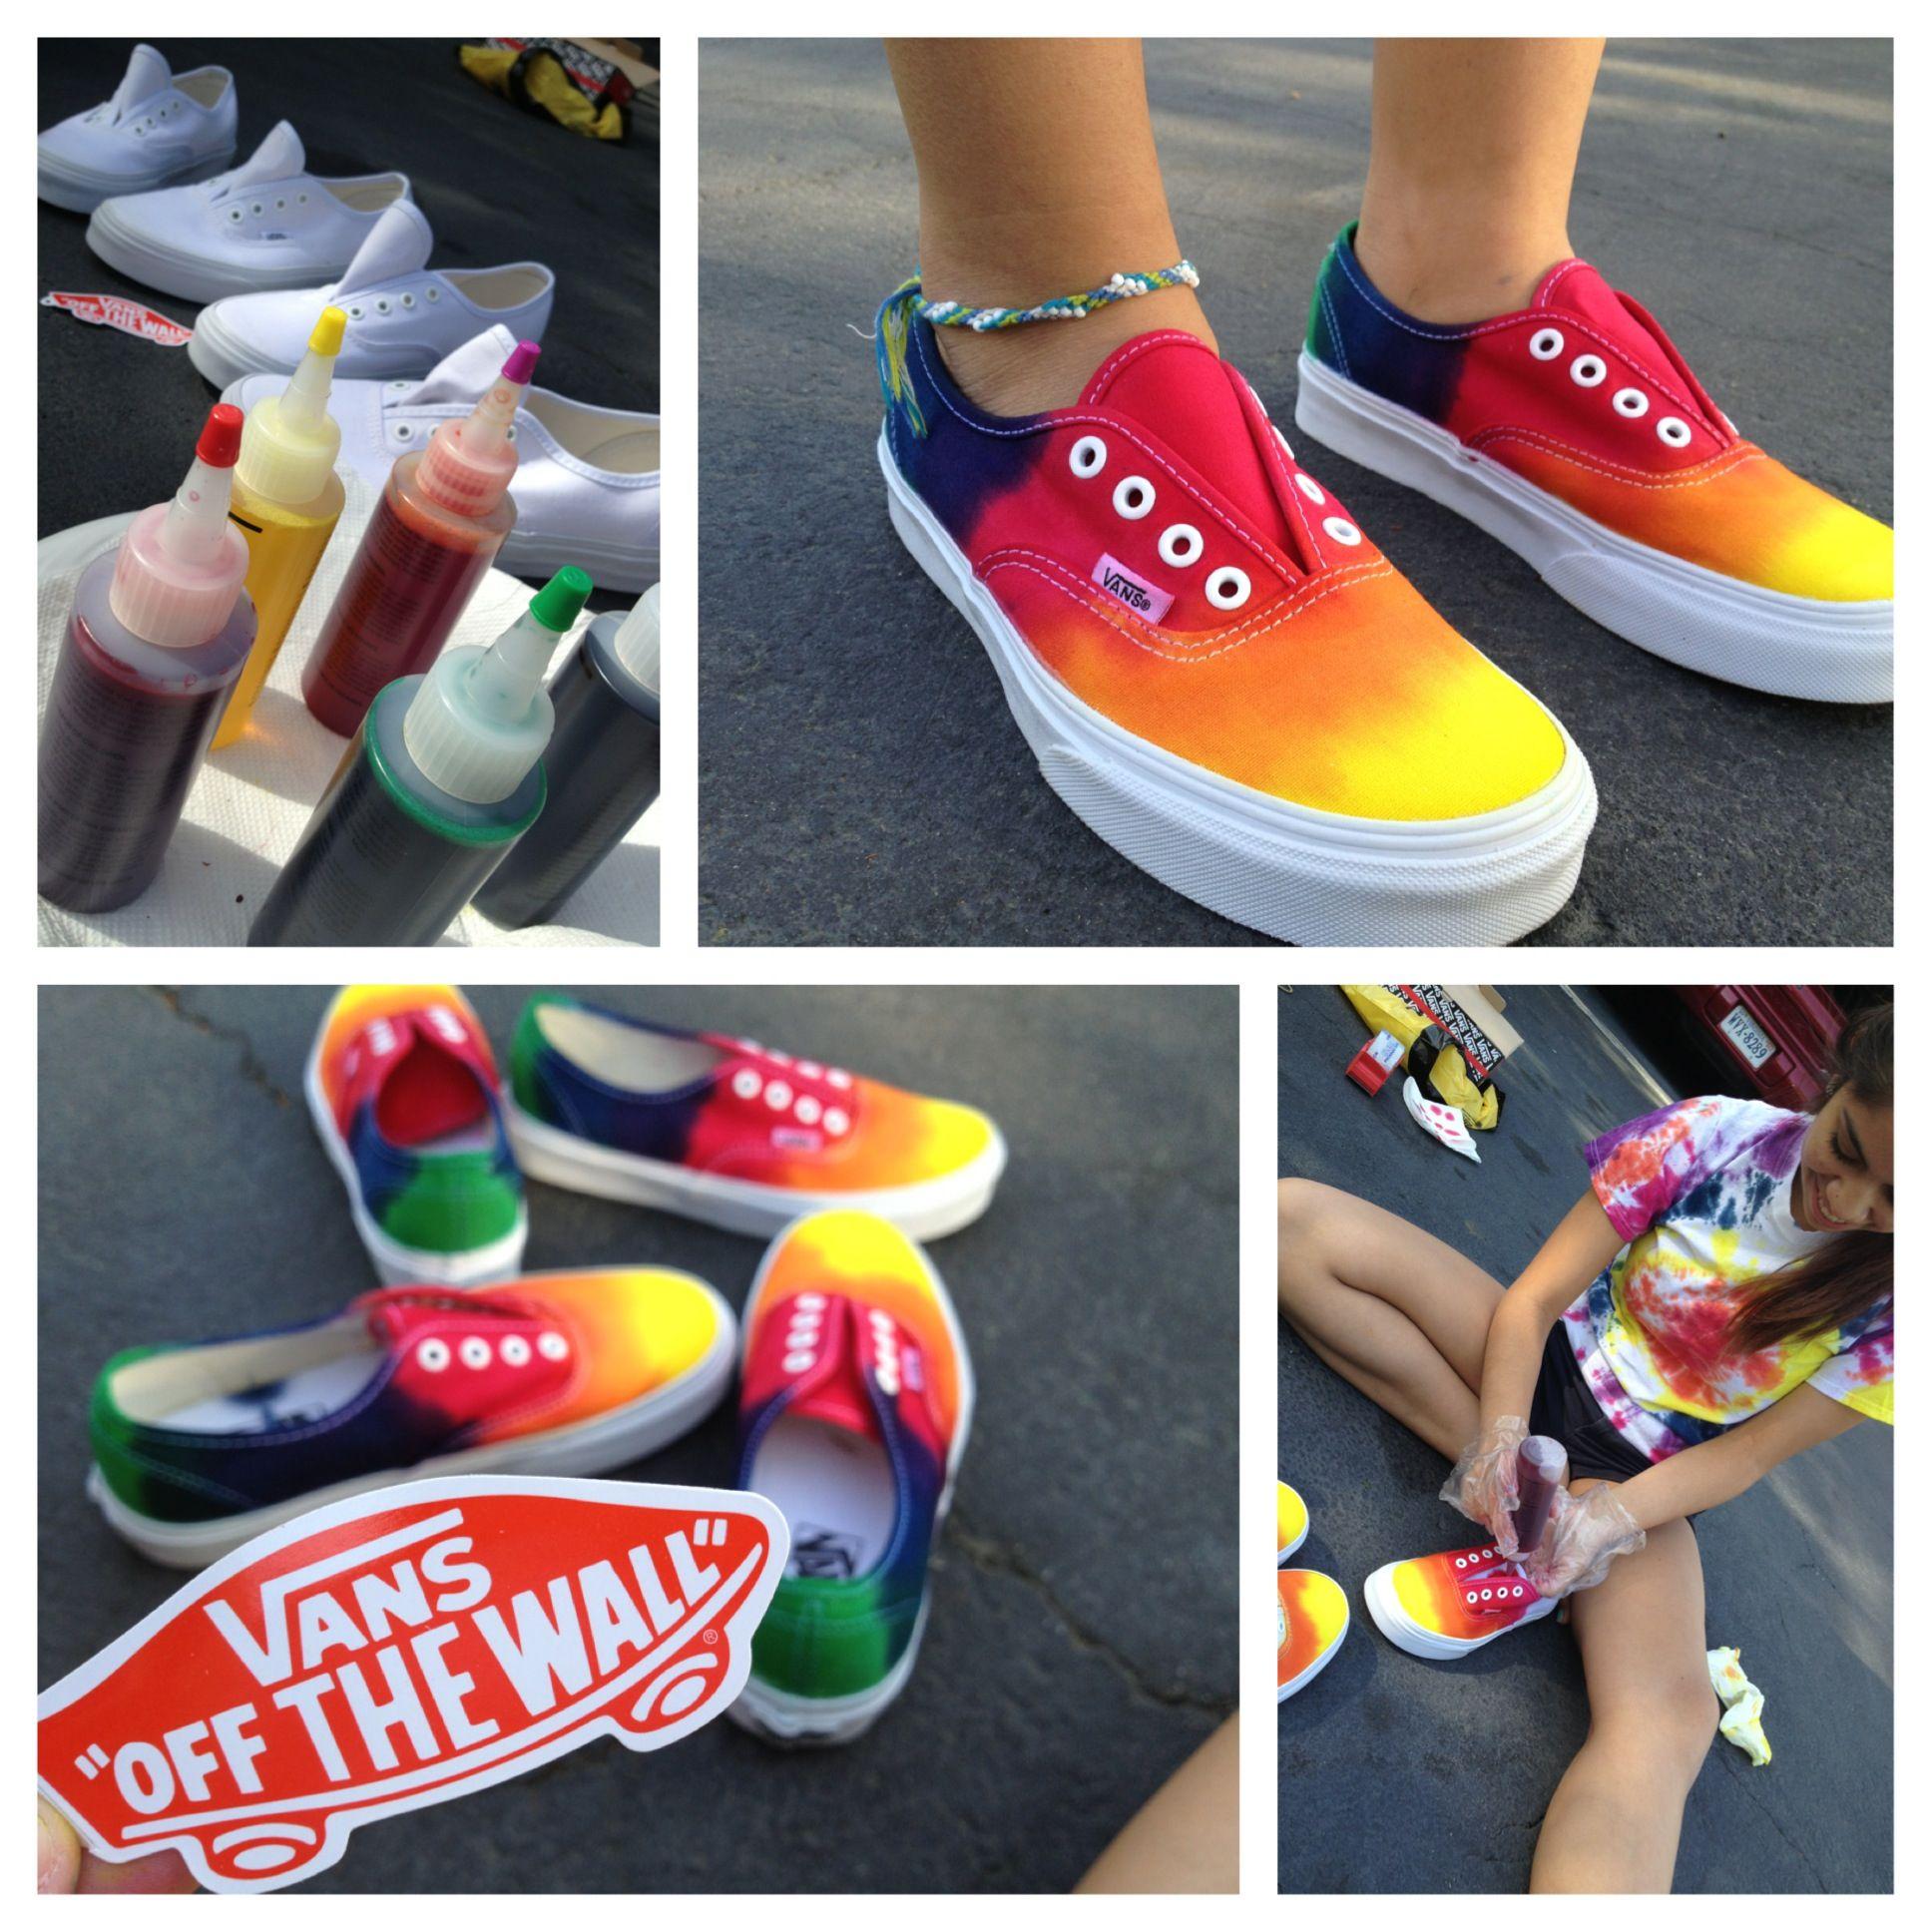 Vans Schuhe Projekt Schuhe Projekt Binden Projekt Binden